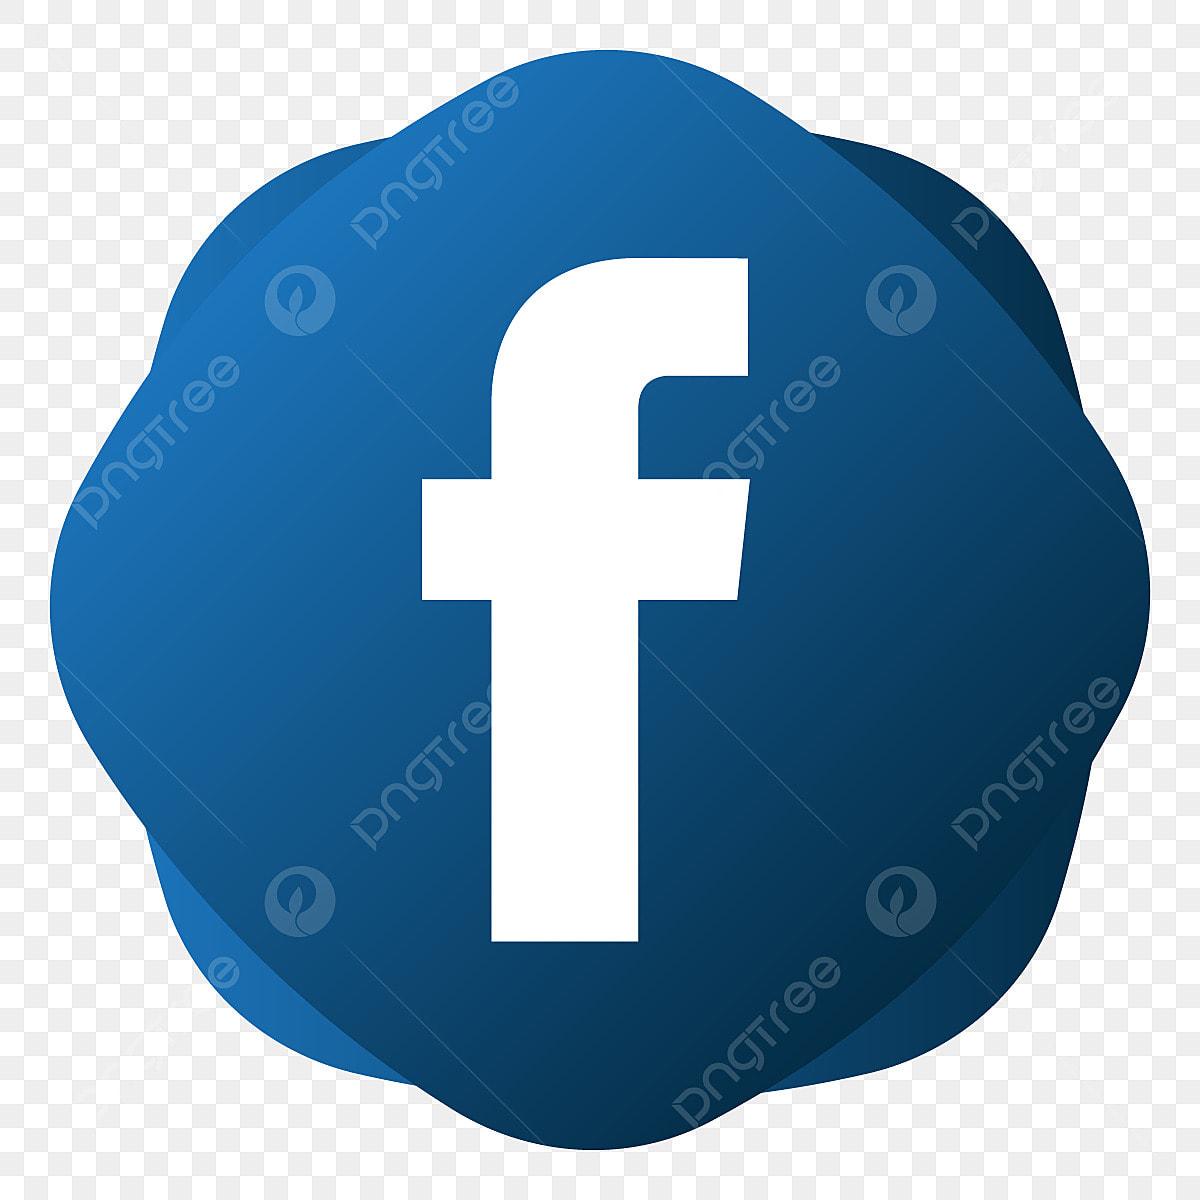 facebook png ic u00f4ne facebook facebook ic u00f4ne fecebook conception elemet png et vecteur pour